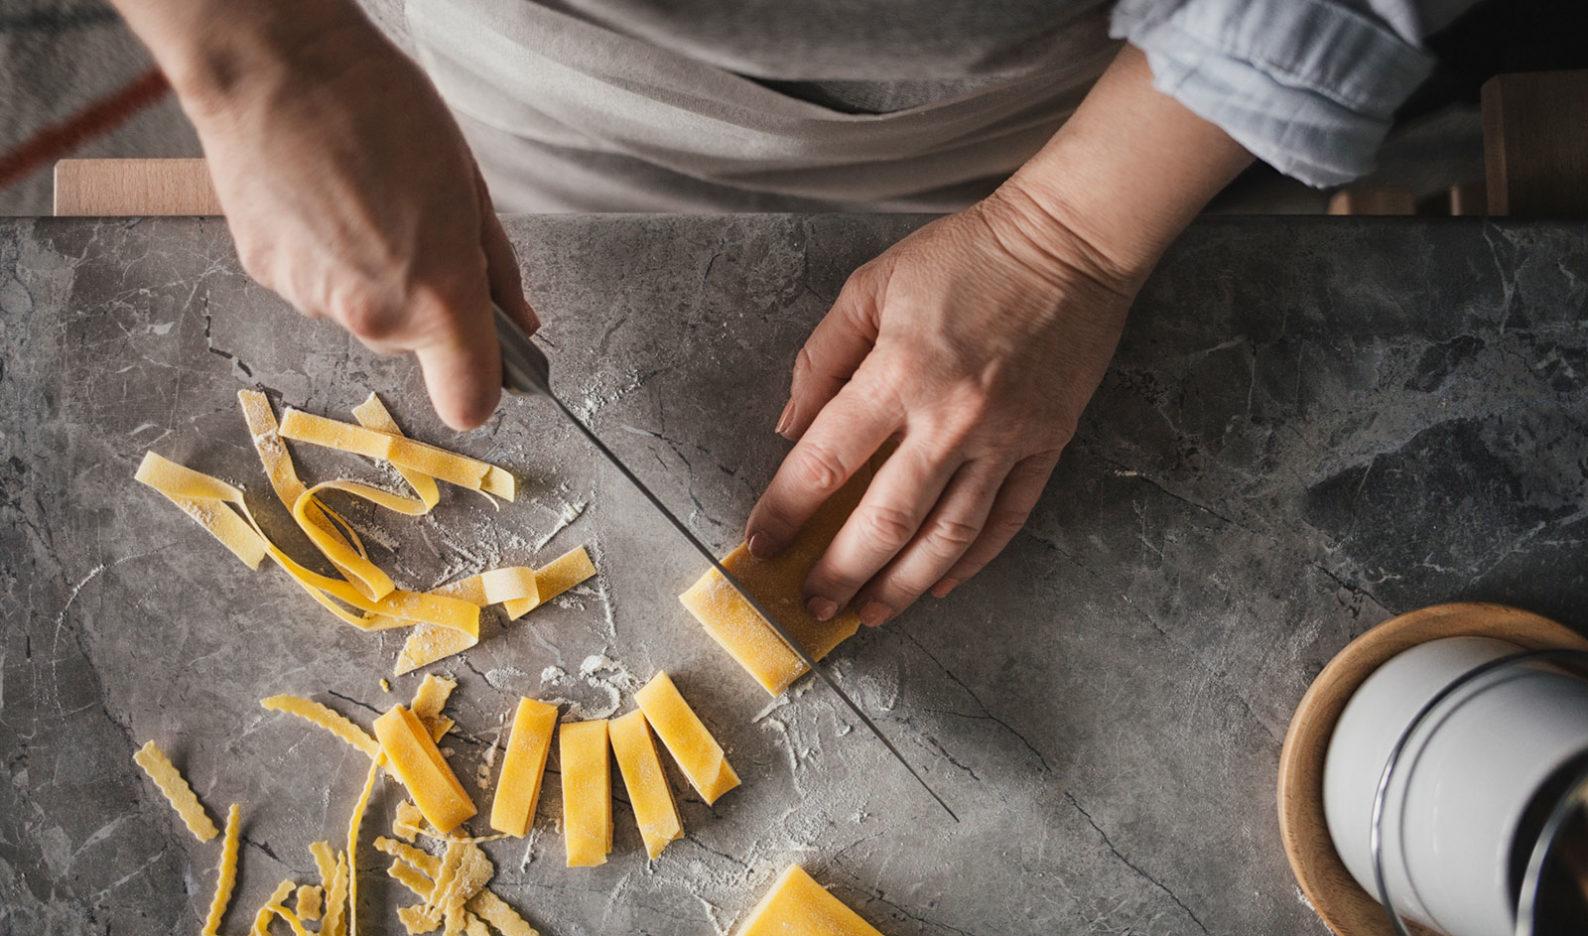 A chef cutting fresh pasta